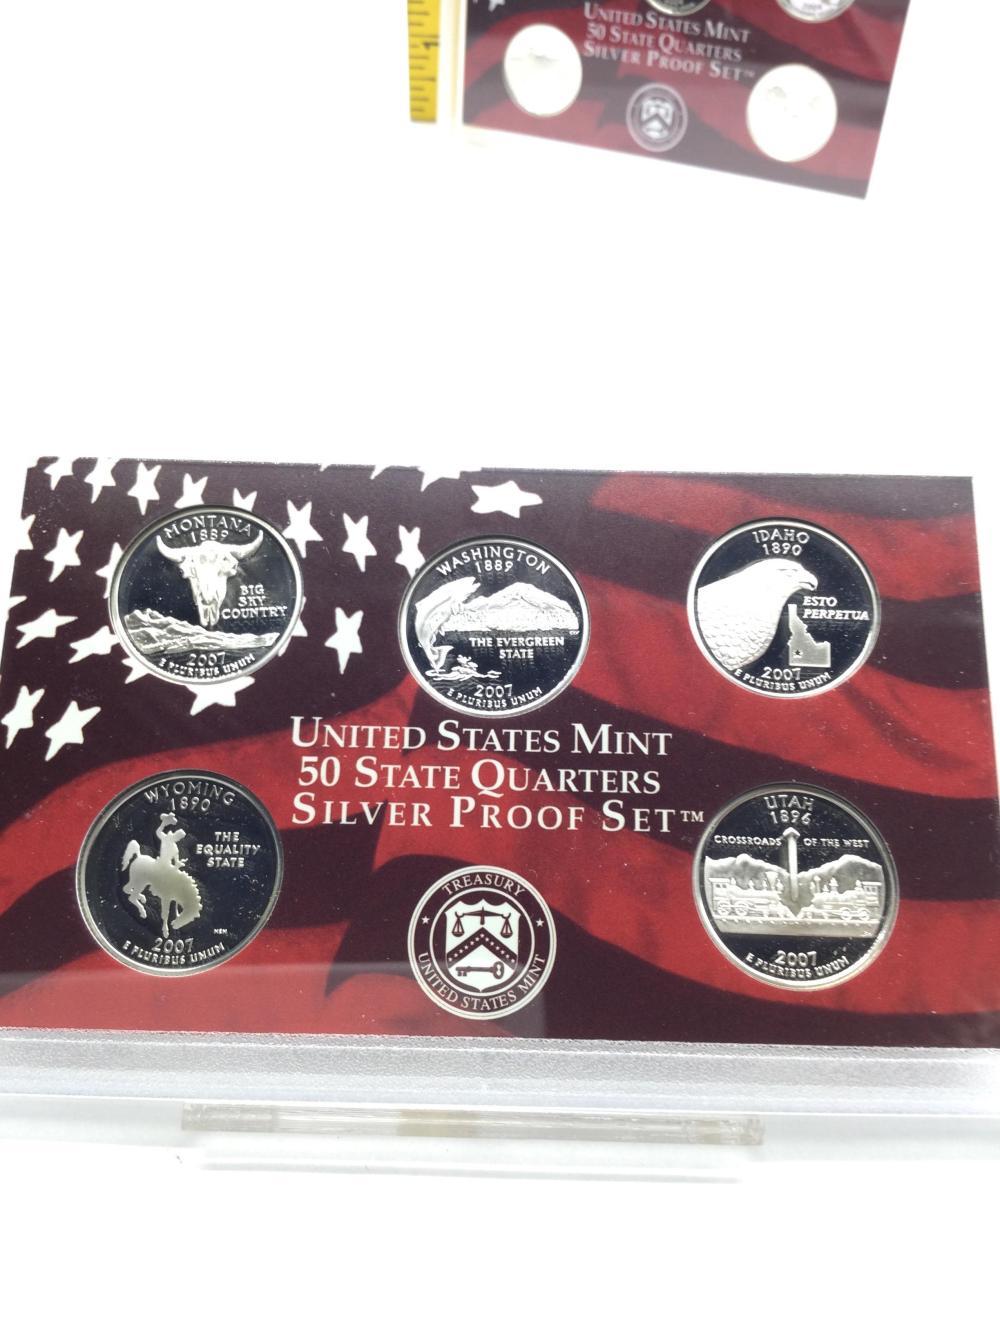 2 State Quarter Silver Proof Sets